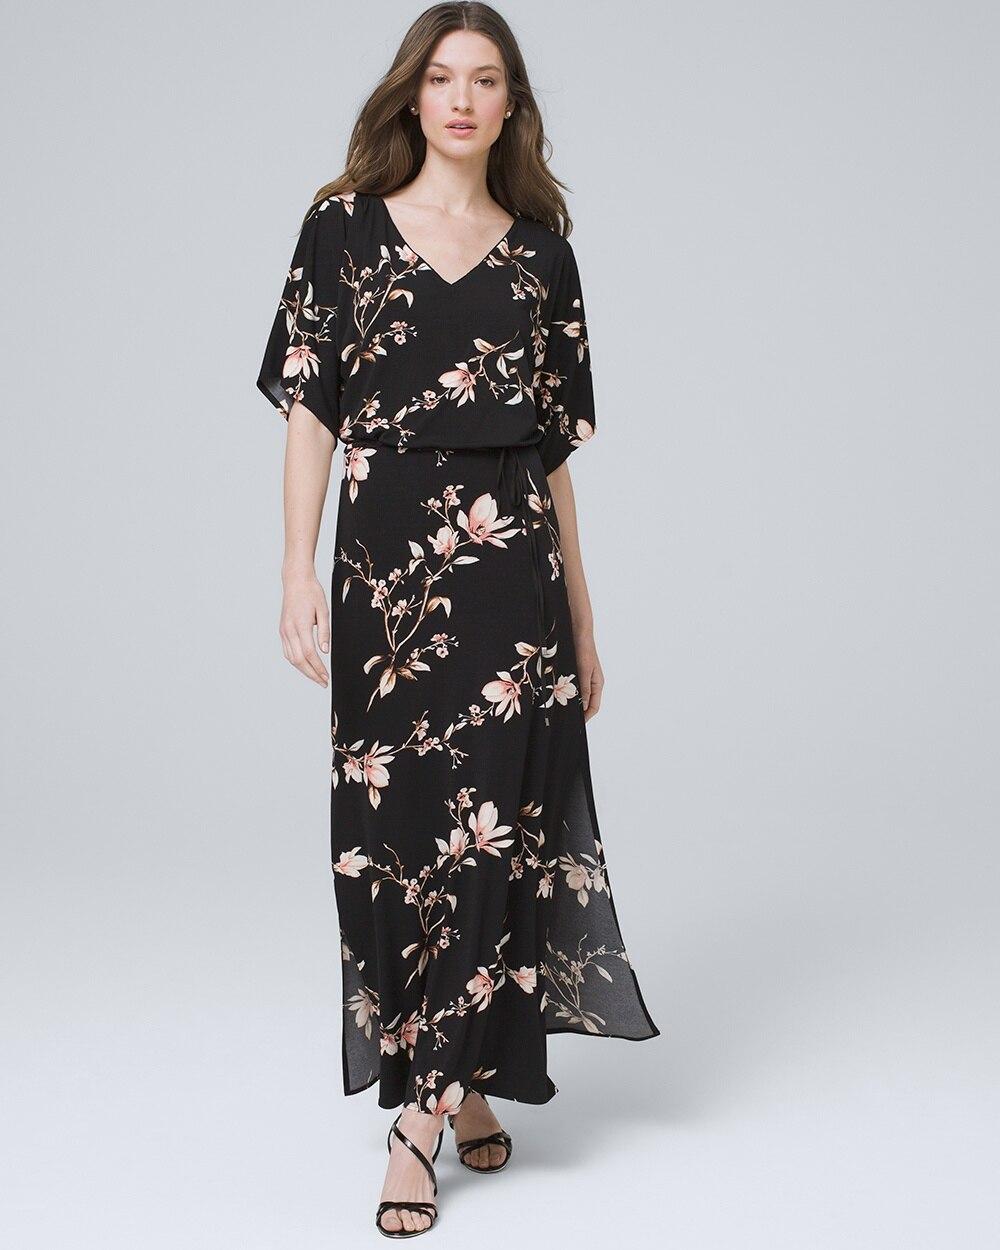 dee250f72340c6 Floral Maxi Dress - White House Black Market